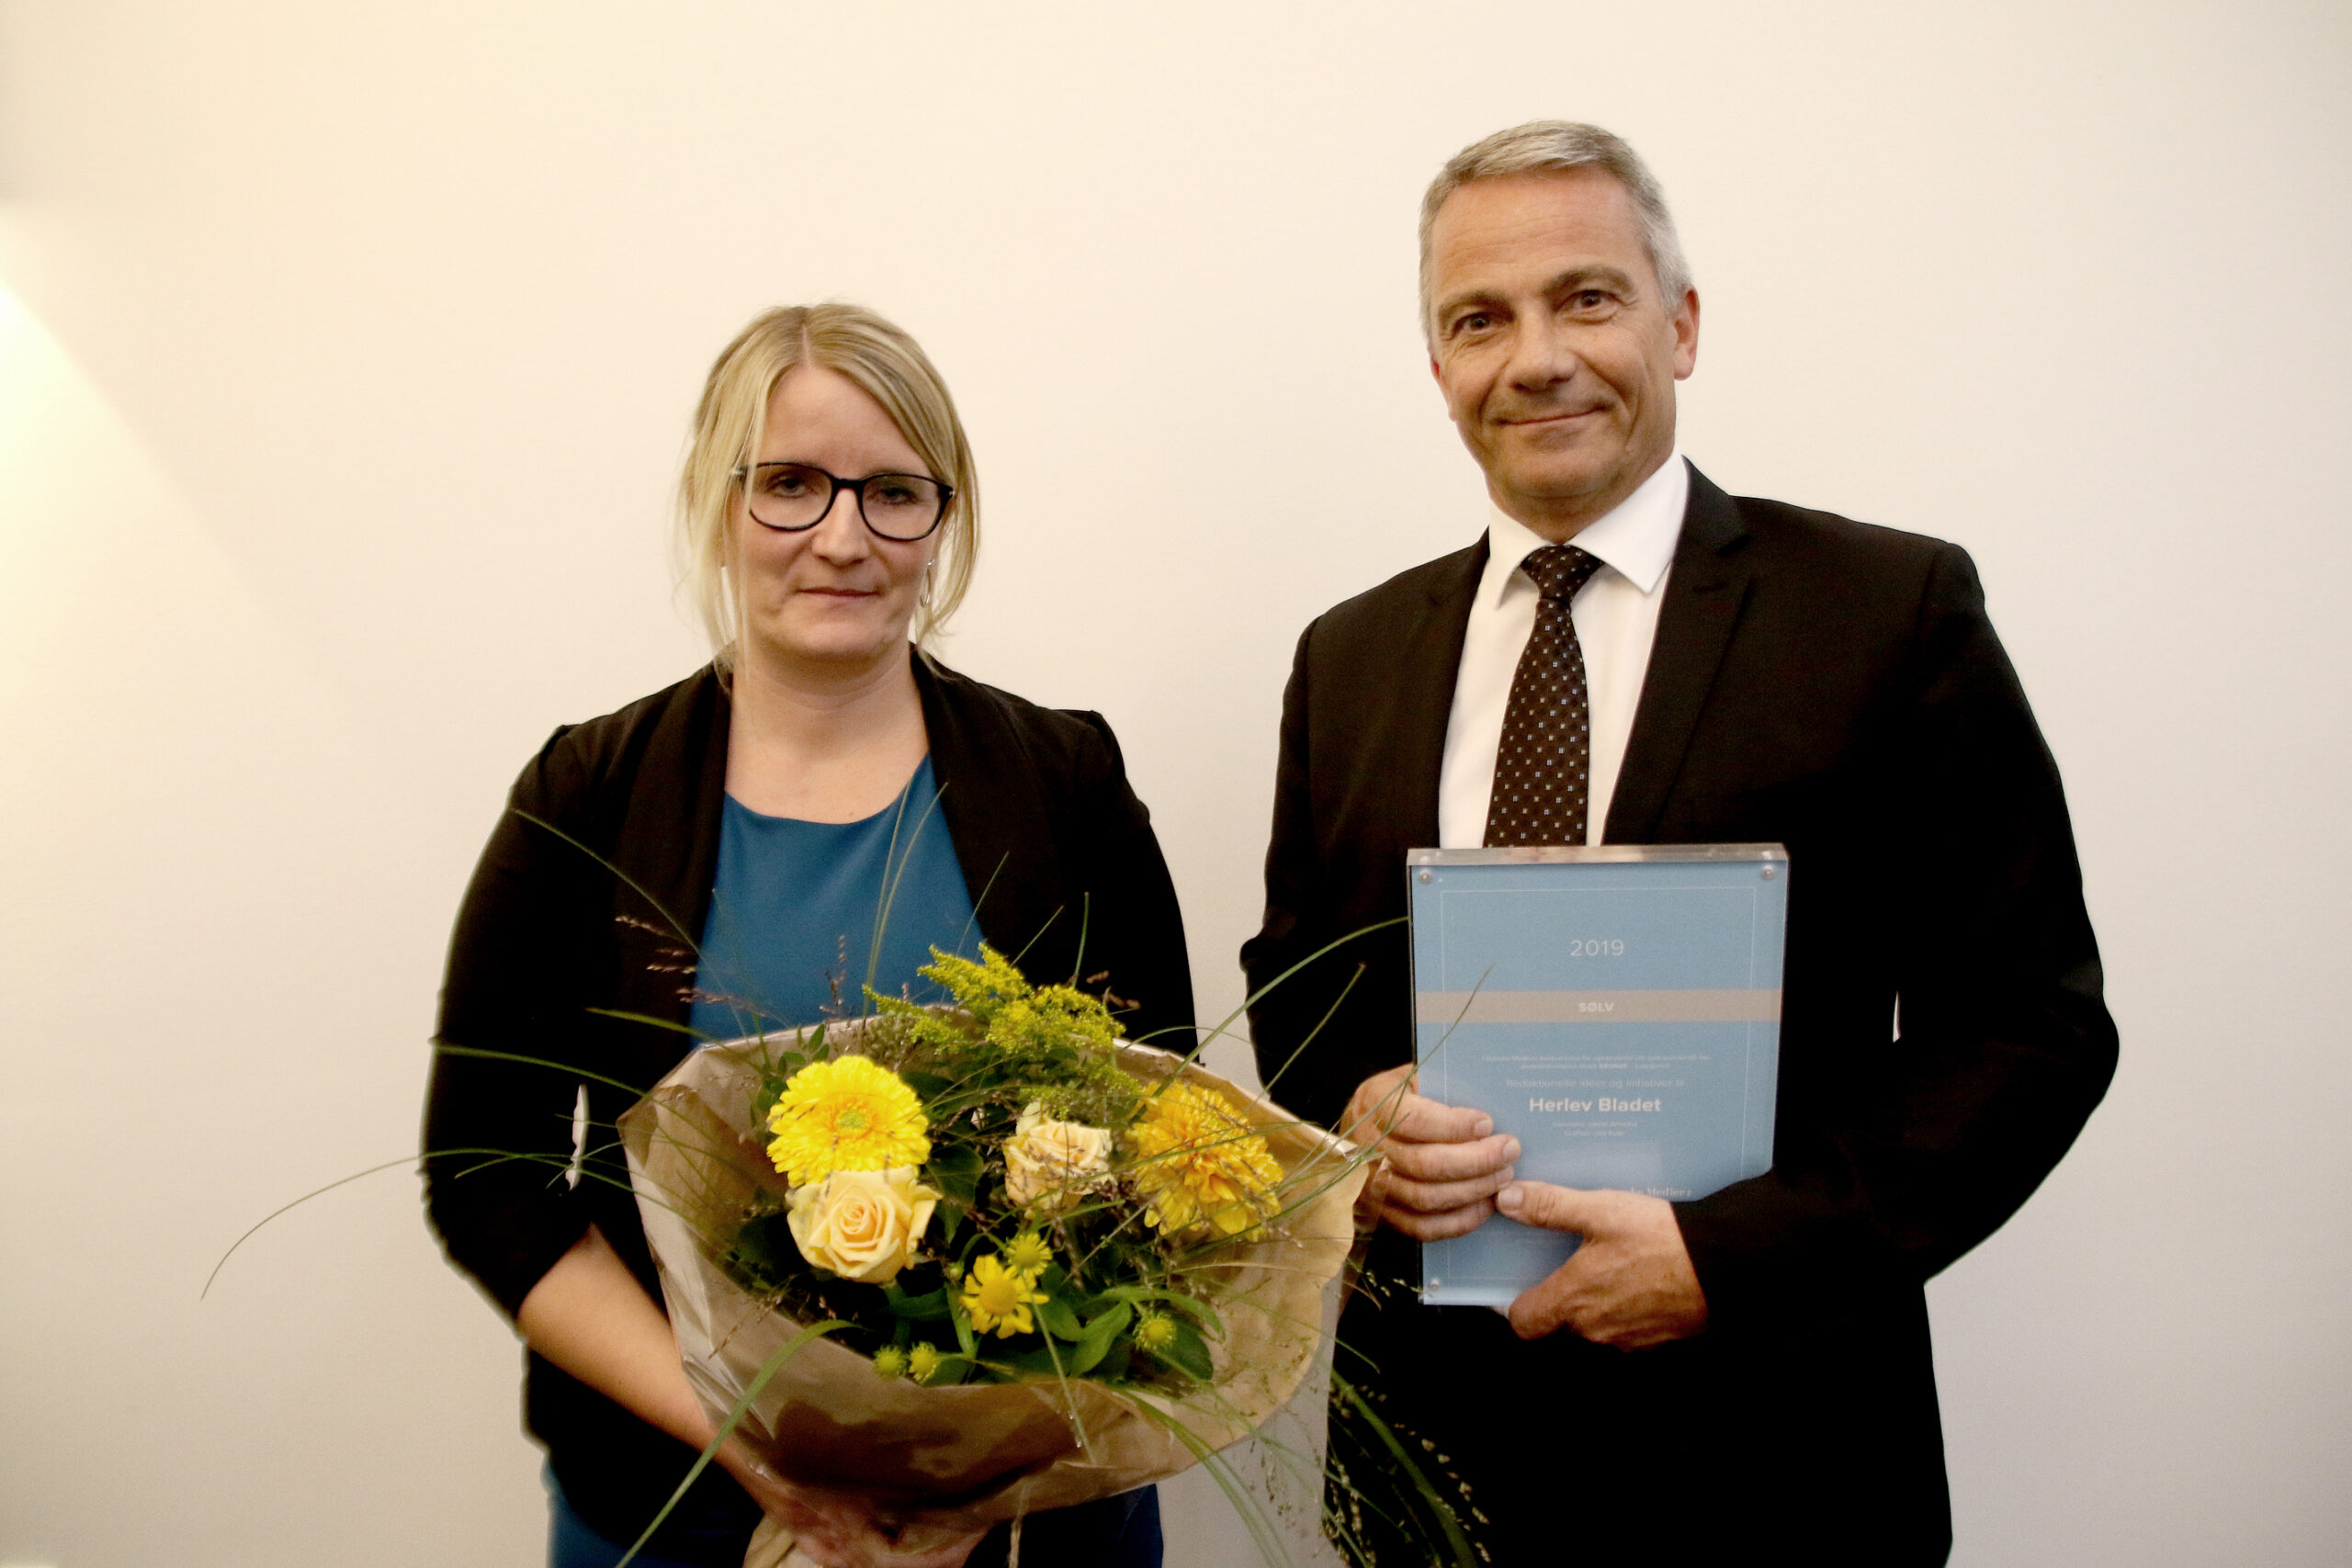 Mette Lyhne og Steffen Glaas, Herlev Bladet